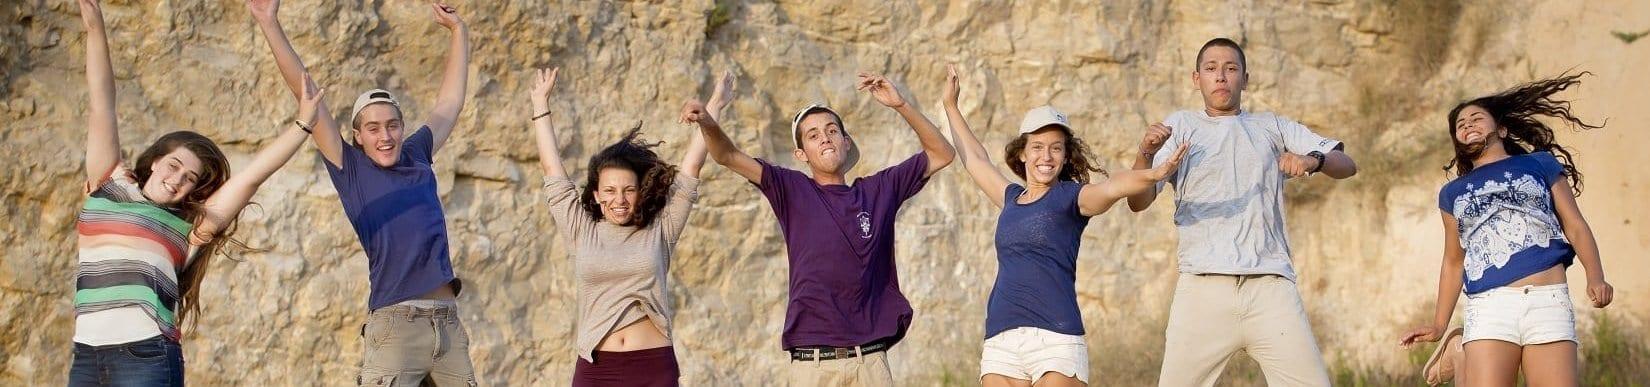 Youths-Moshe-Shai-49-1-aspect-ratio-x